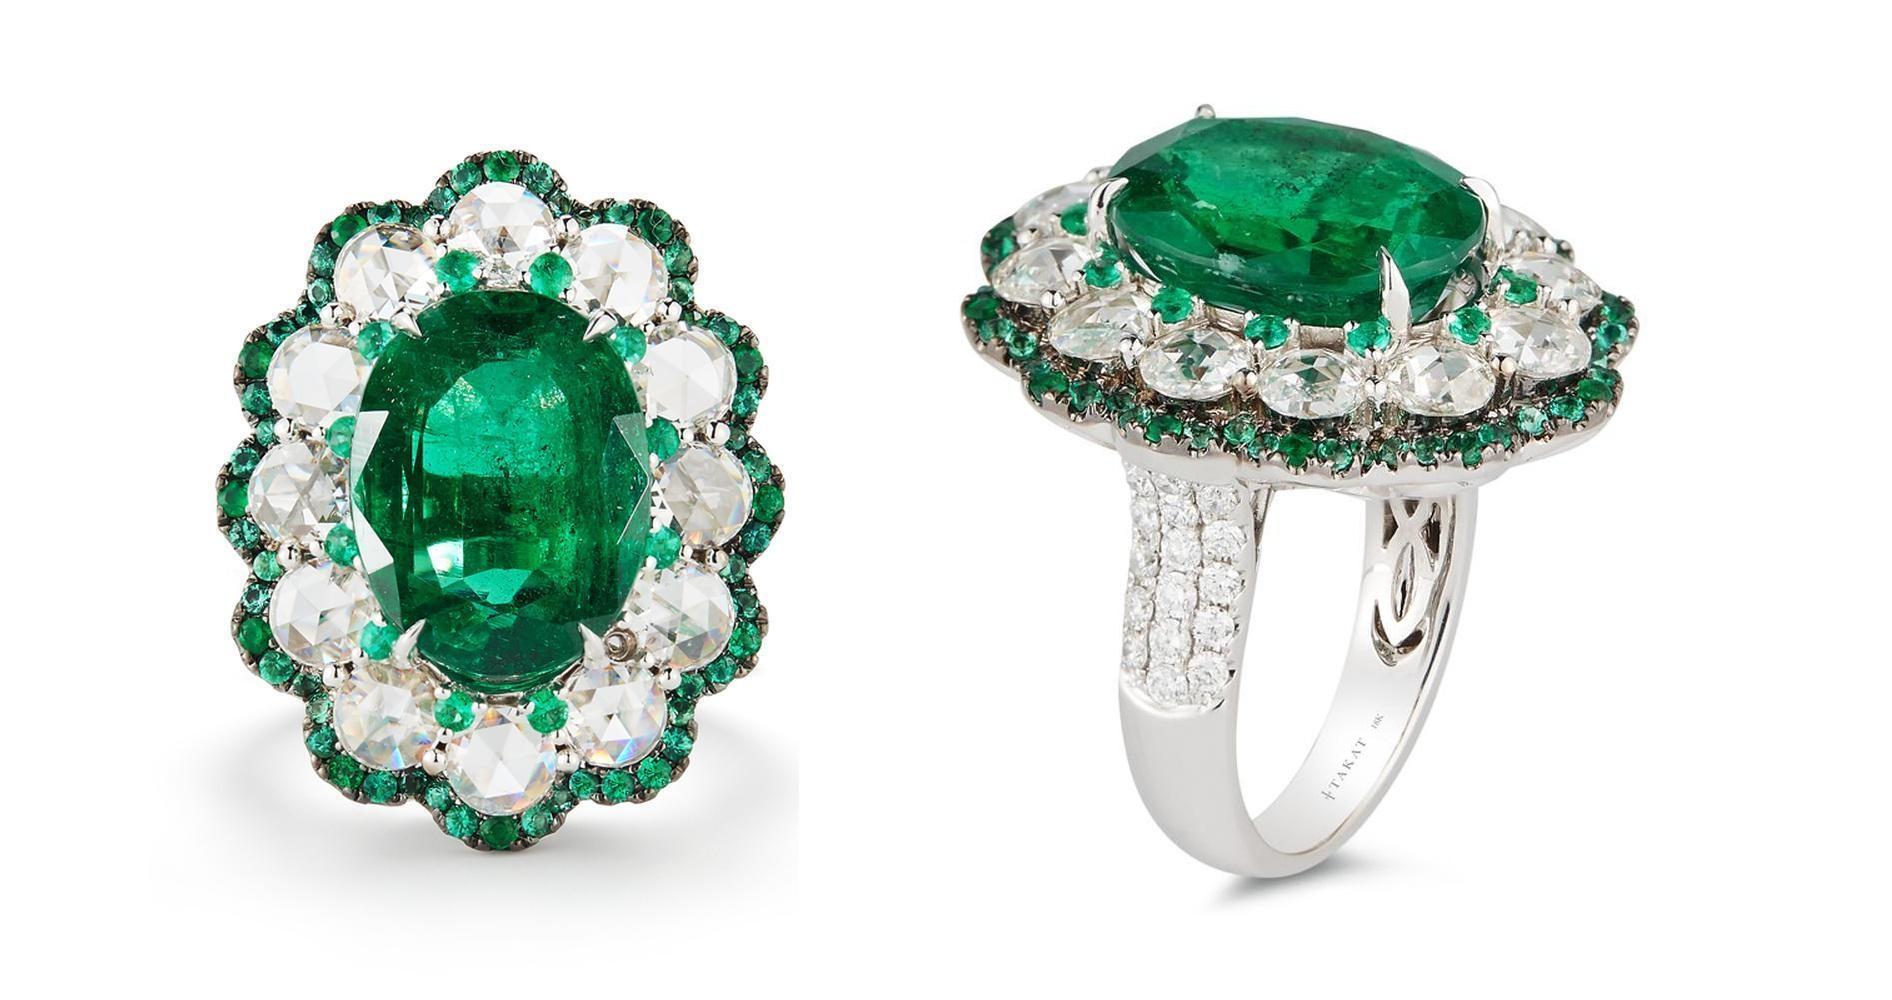 6.07 Carat Natural Green Oval Emerald & Rose Cut Diamonds 18k White Gold Ring